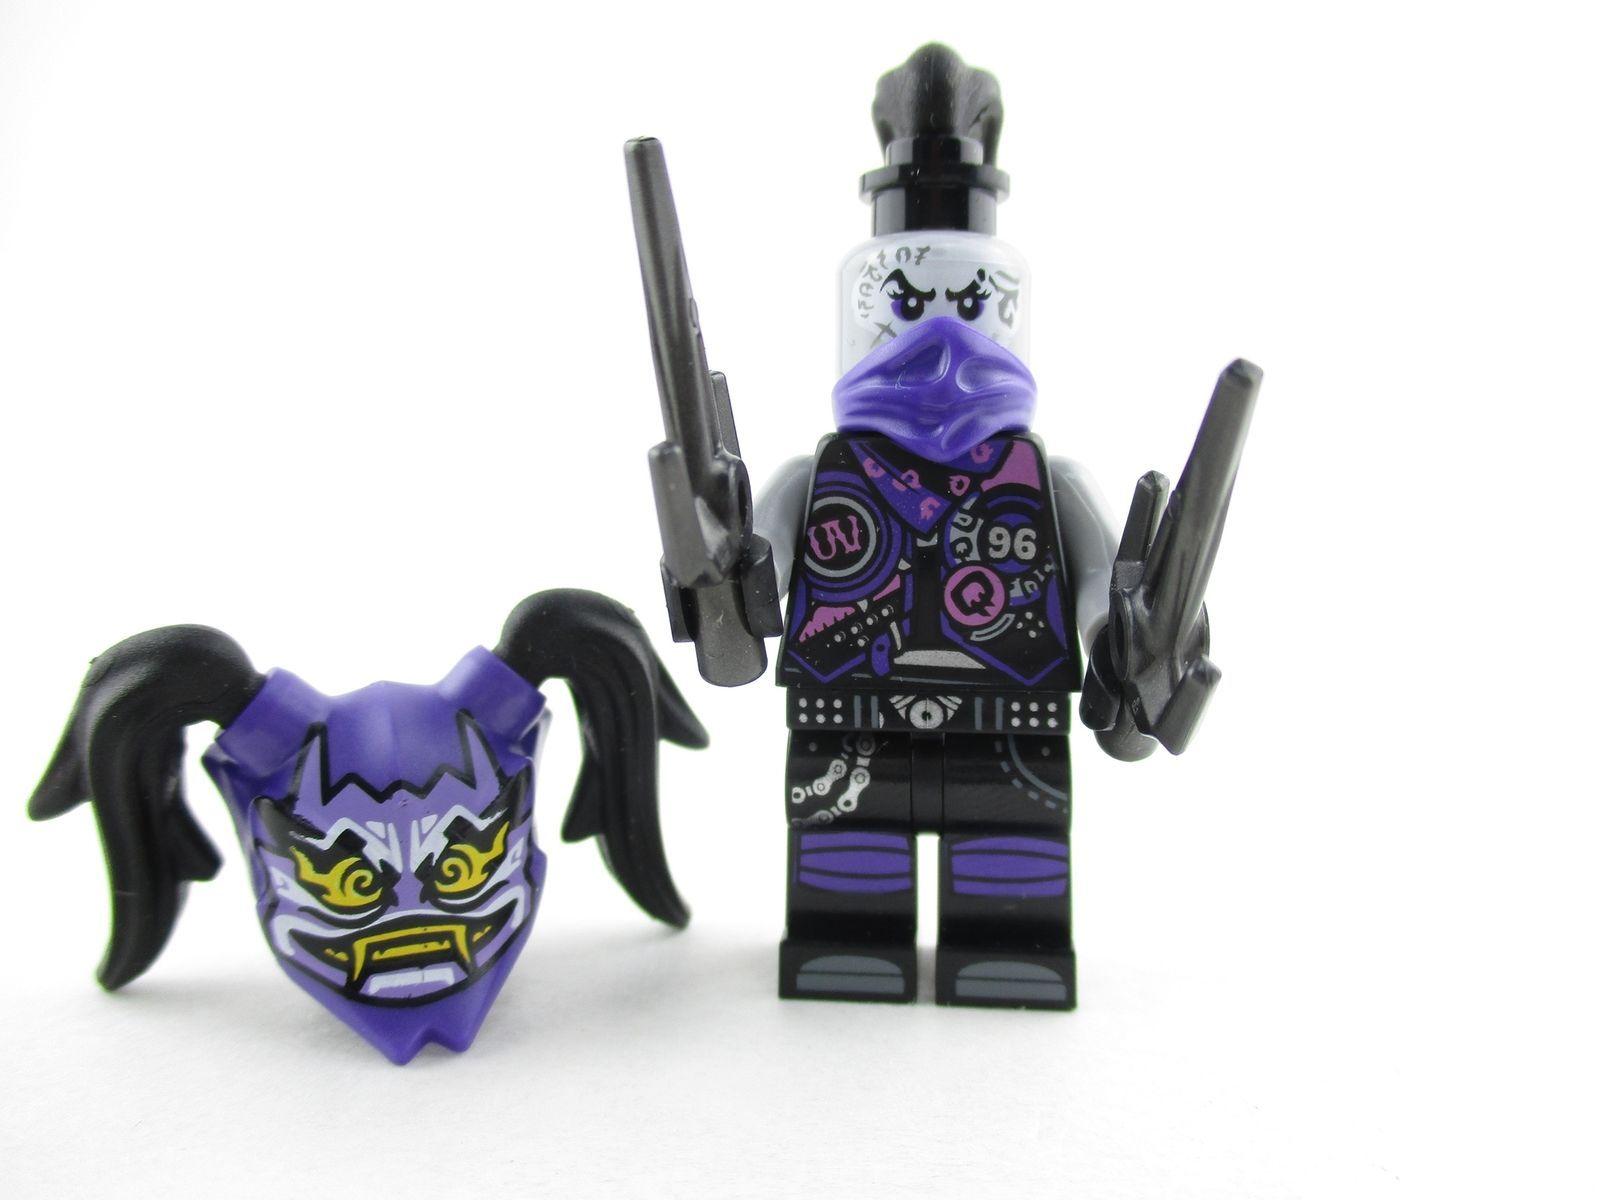 $8.99 - Lego Ninjago Ultra Violet Minifigure + Oni Mask Of ...